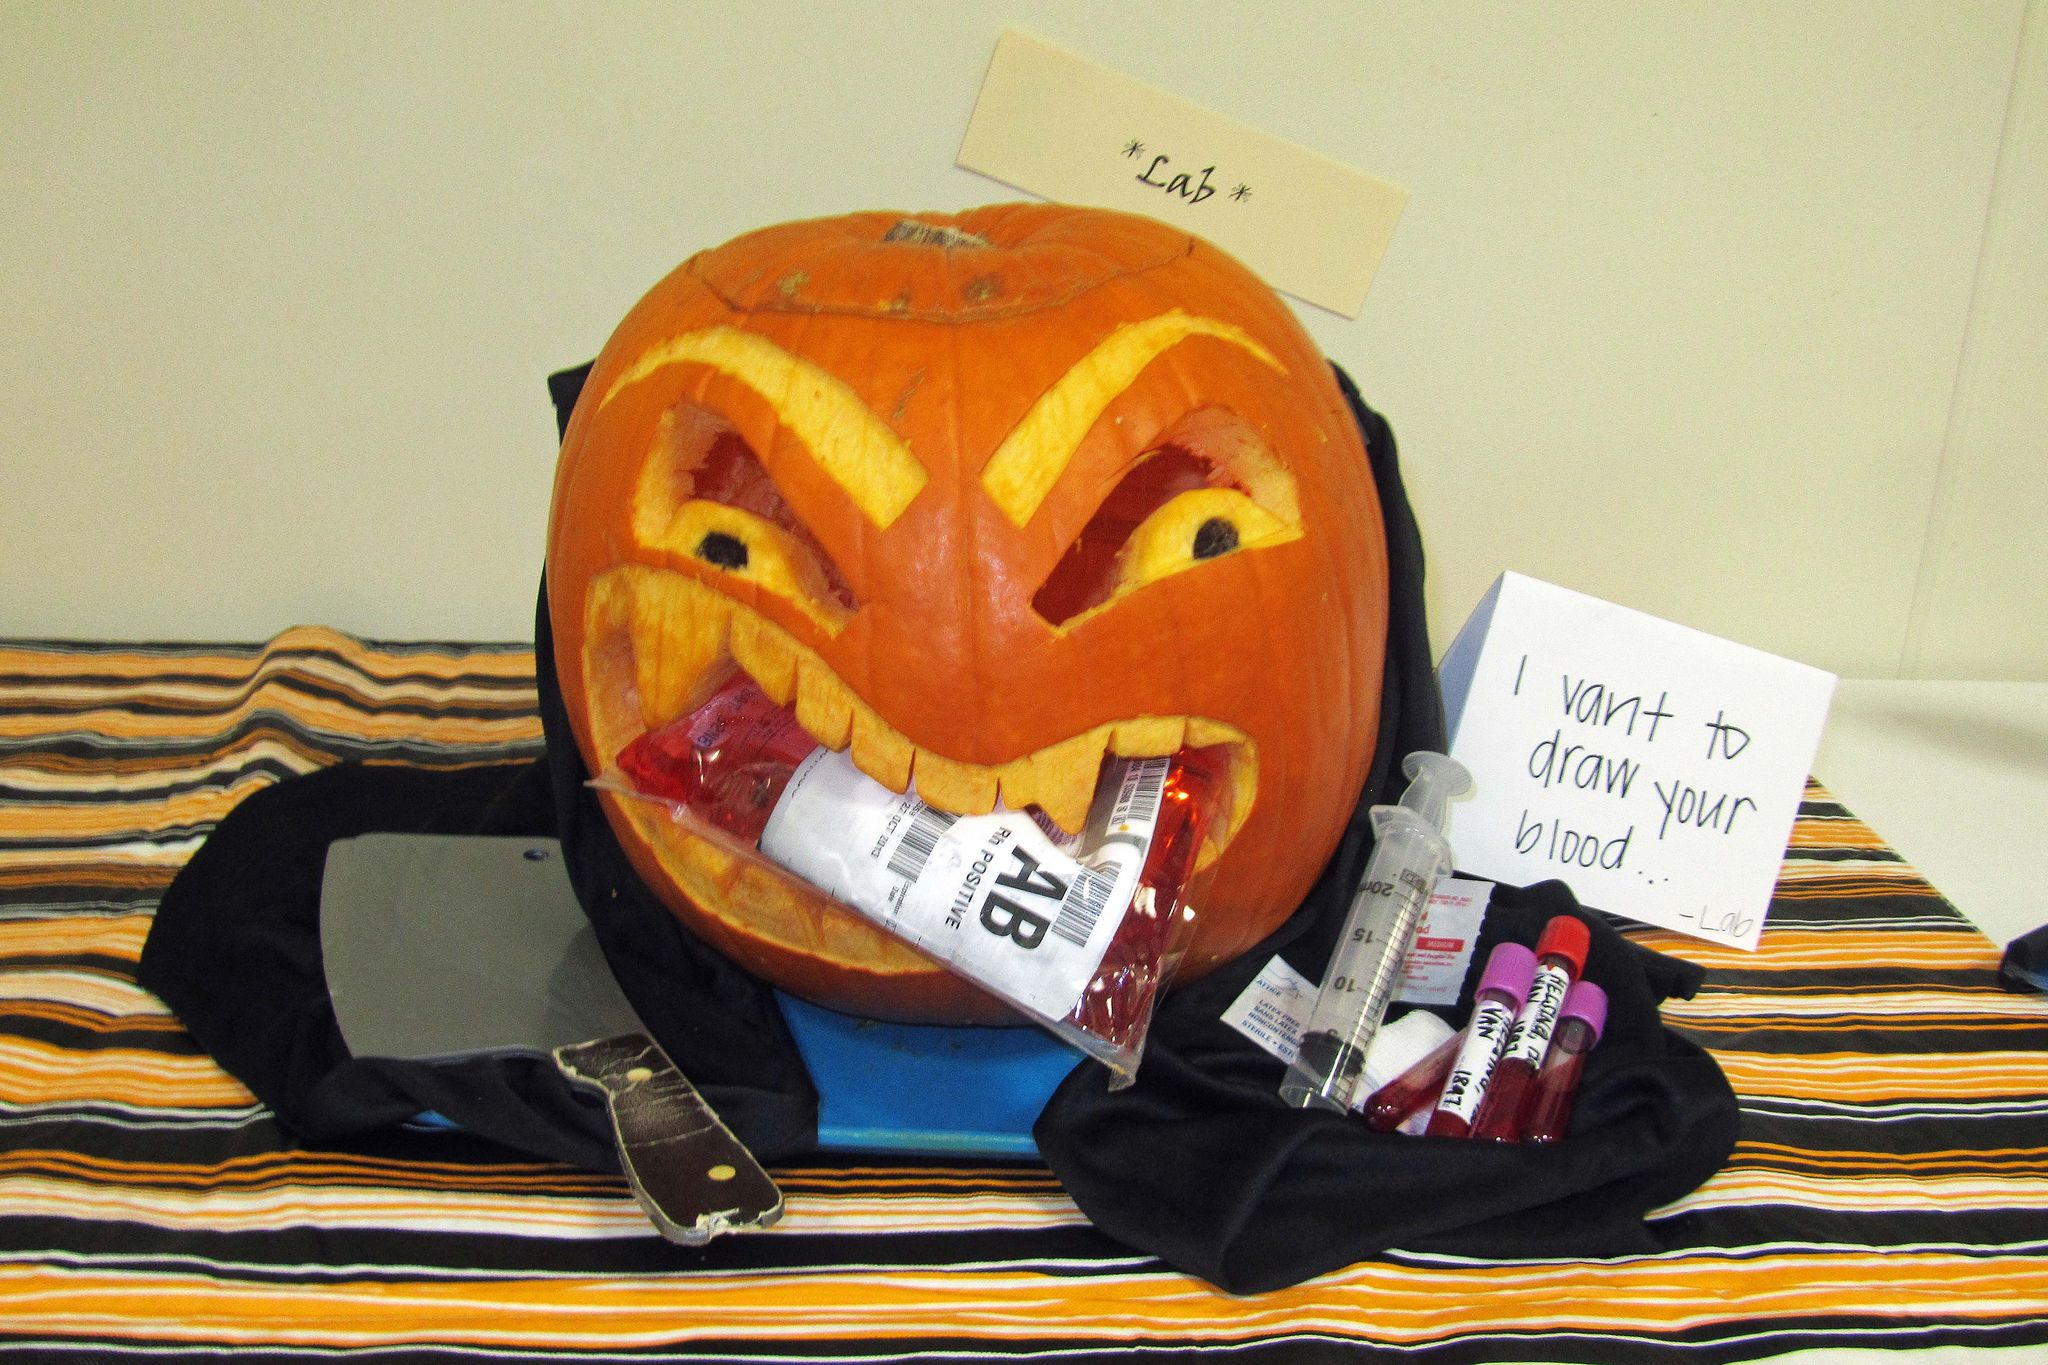 34+ Pumpkin carving contest ideas ideas in 2021